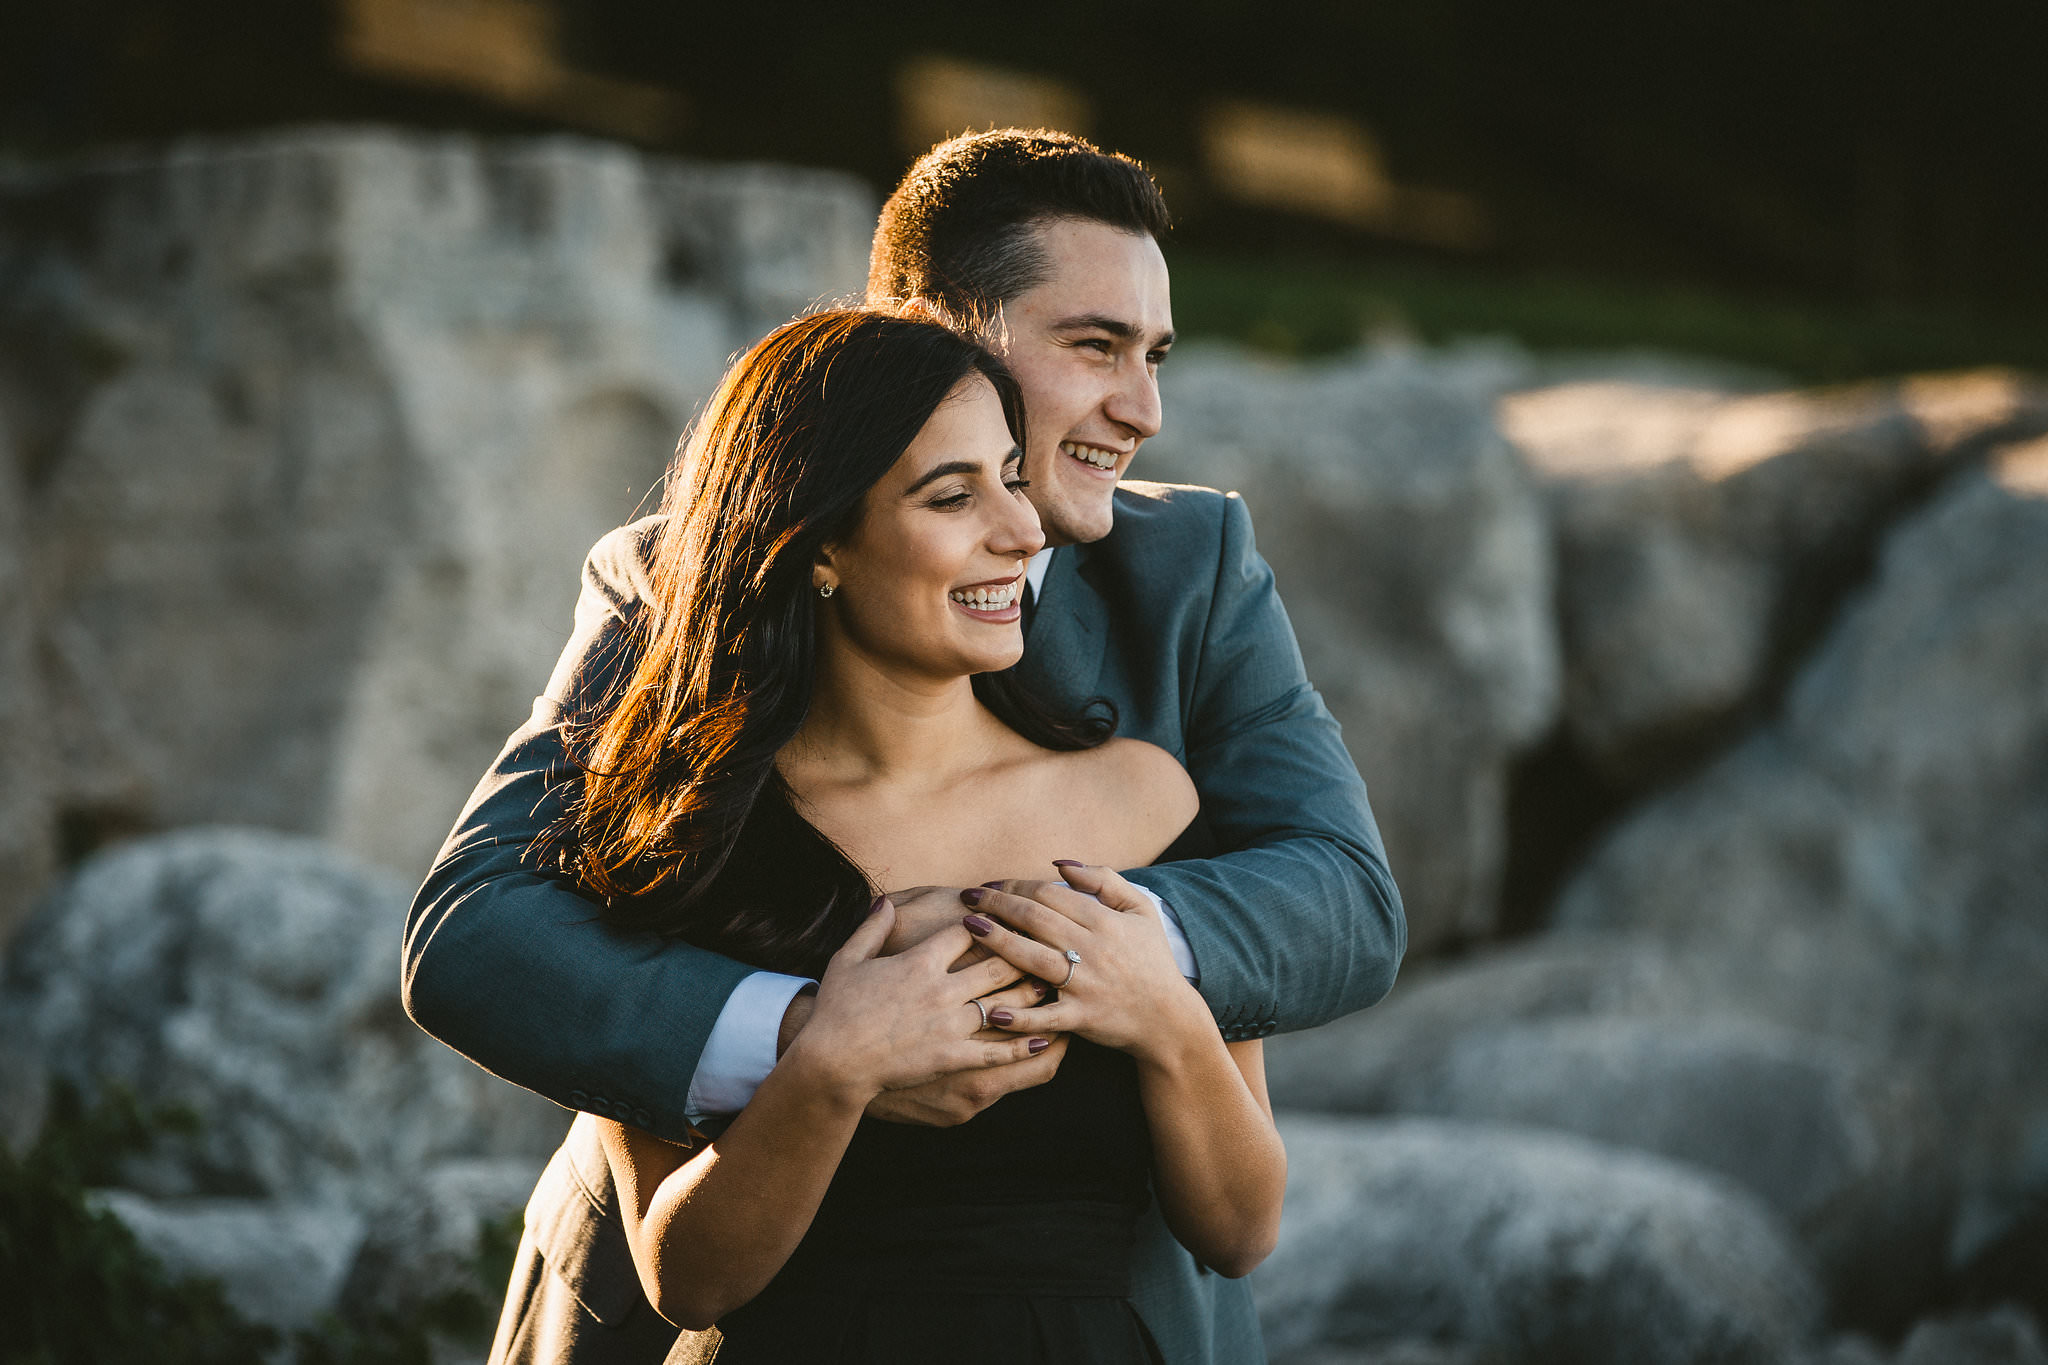 Rebecca Michael Niagara On The Lake engagement photos 40 - Kitchener Wedding Photographer